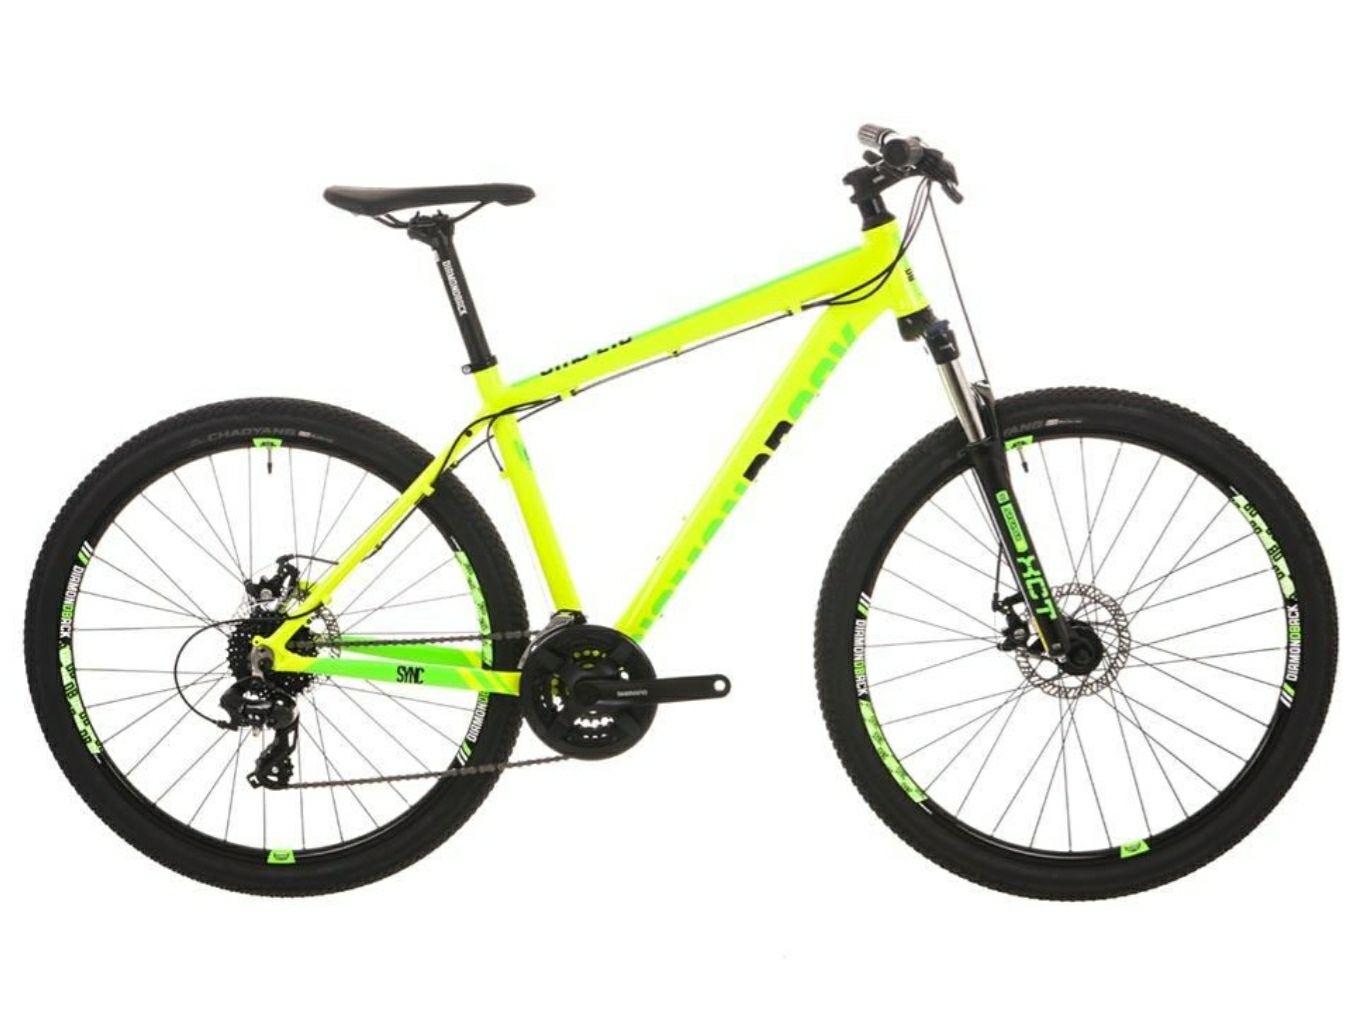 Diamondback Sync 2.0 Mens Mountain Bike 27.5 - Yellow - £289.99 delivered @ Fawkes Cycles